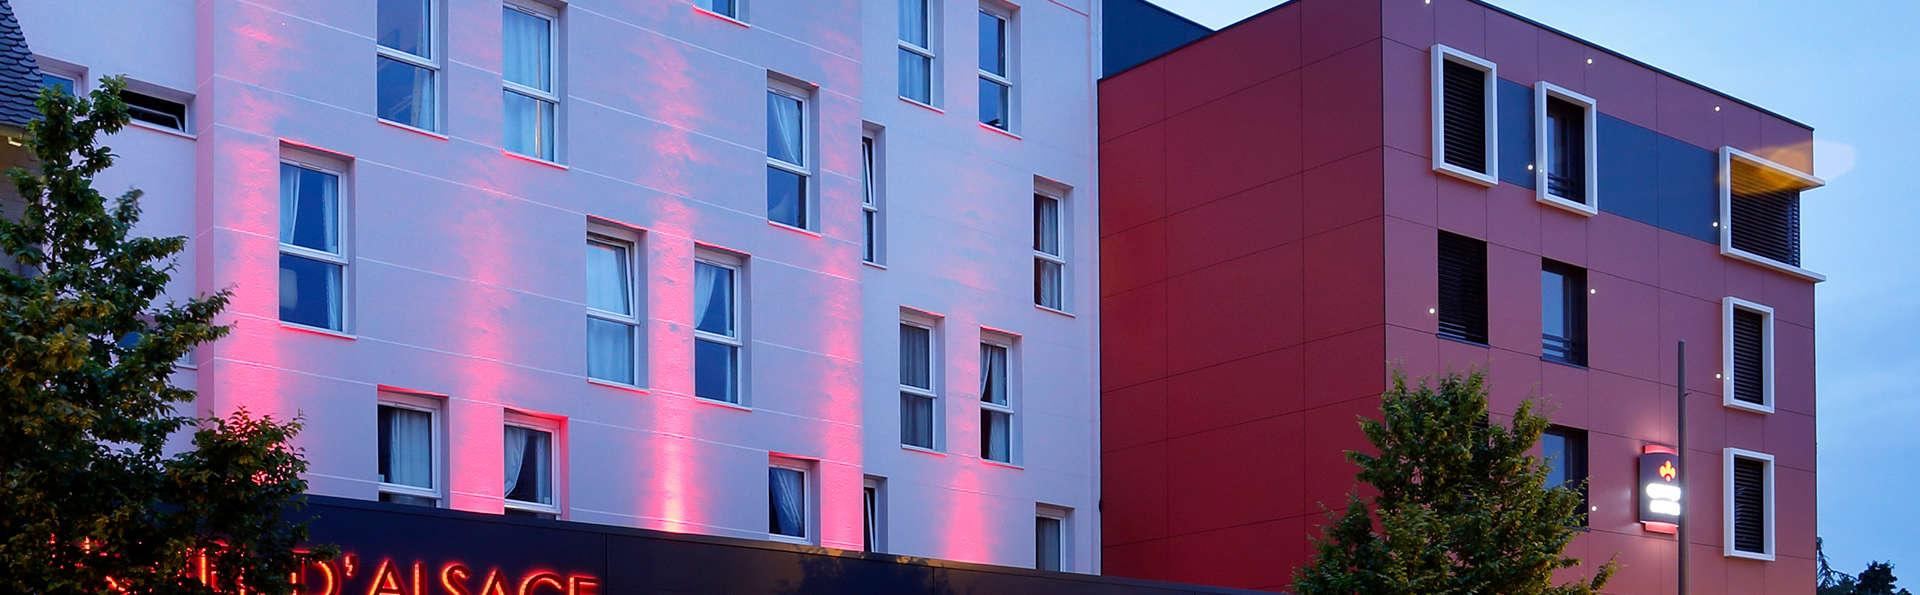 Hotel The Originals d'Alsace Strasbourg Sud (ex Qualys-Hotel) - Edit_Front.jpg